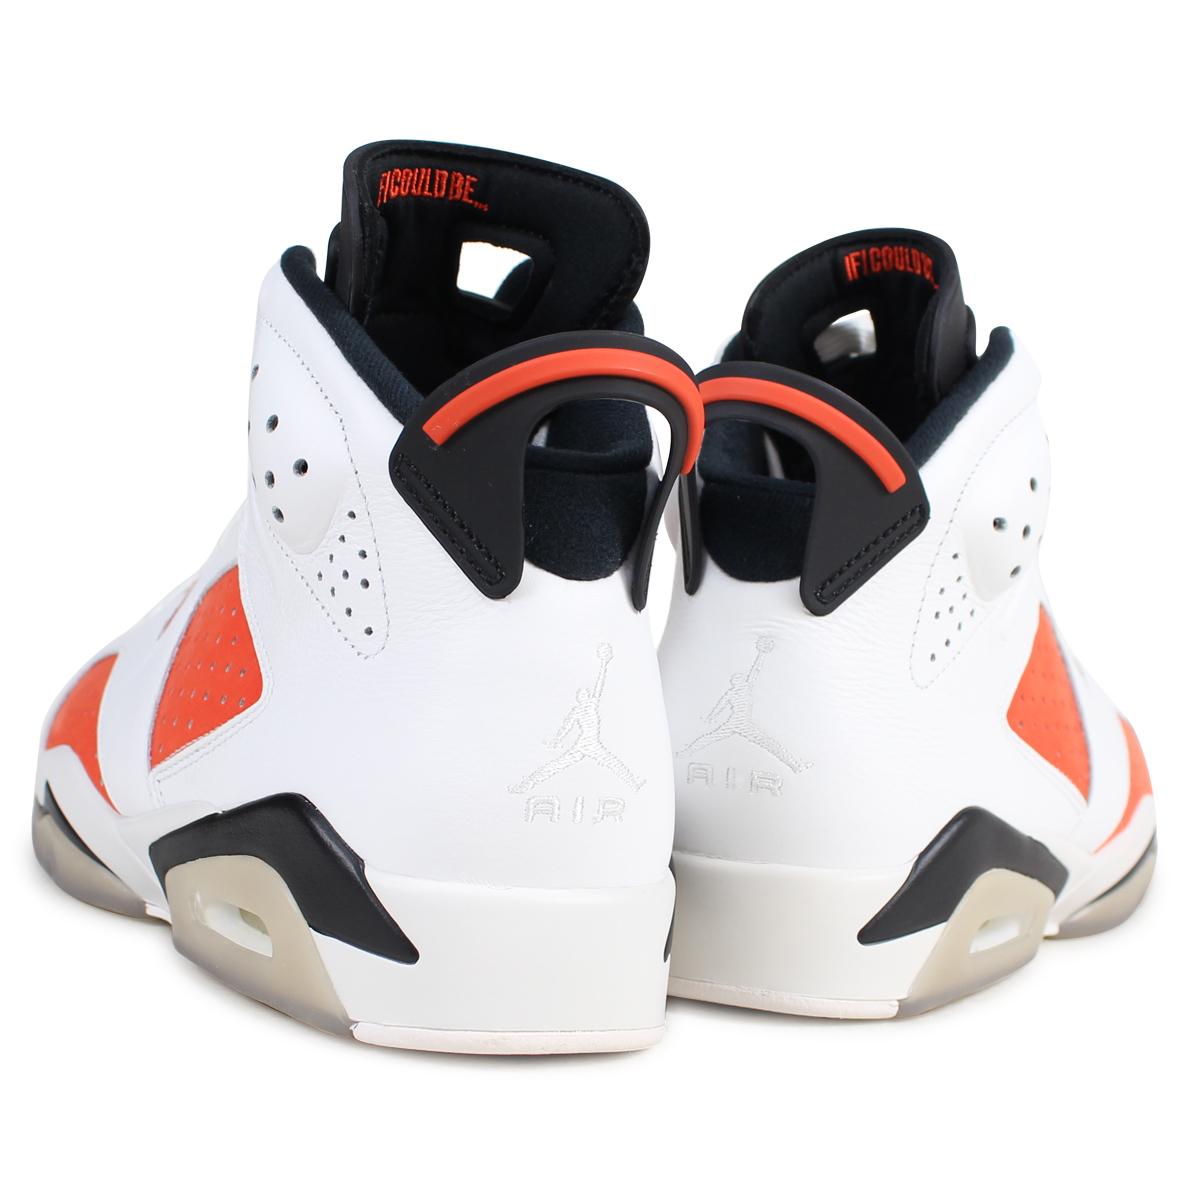 b3f65f2103fe13 ... NIKE Nike Air Jordan 6 nostalgic sneakers AIR JORDAN 6 RETRO GATORADE  384